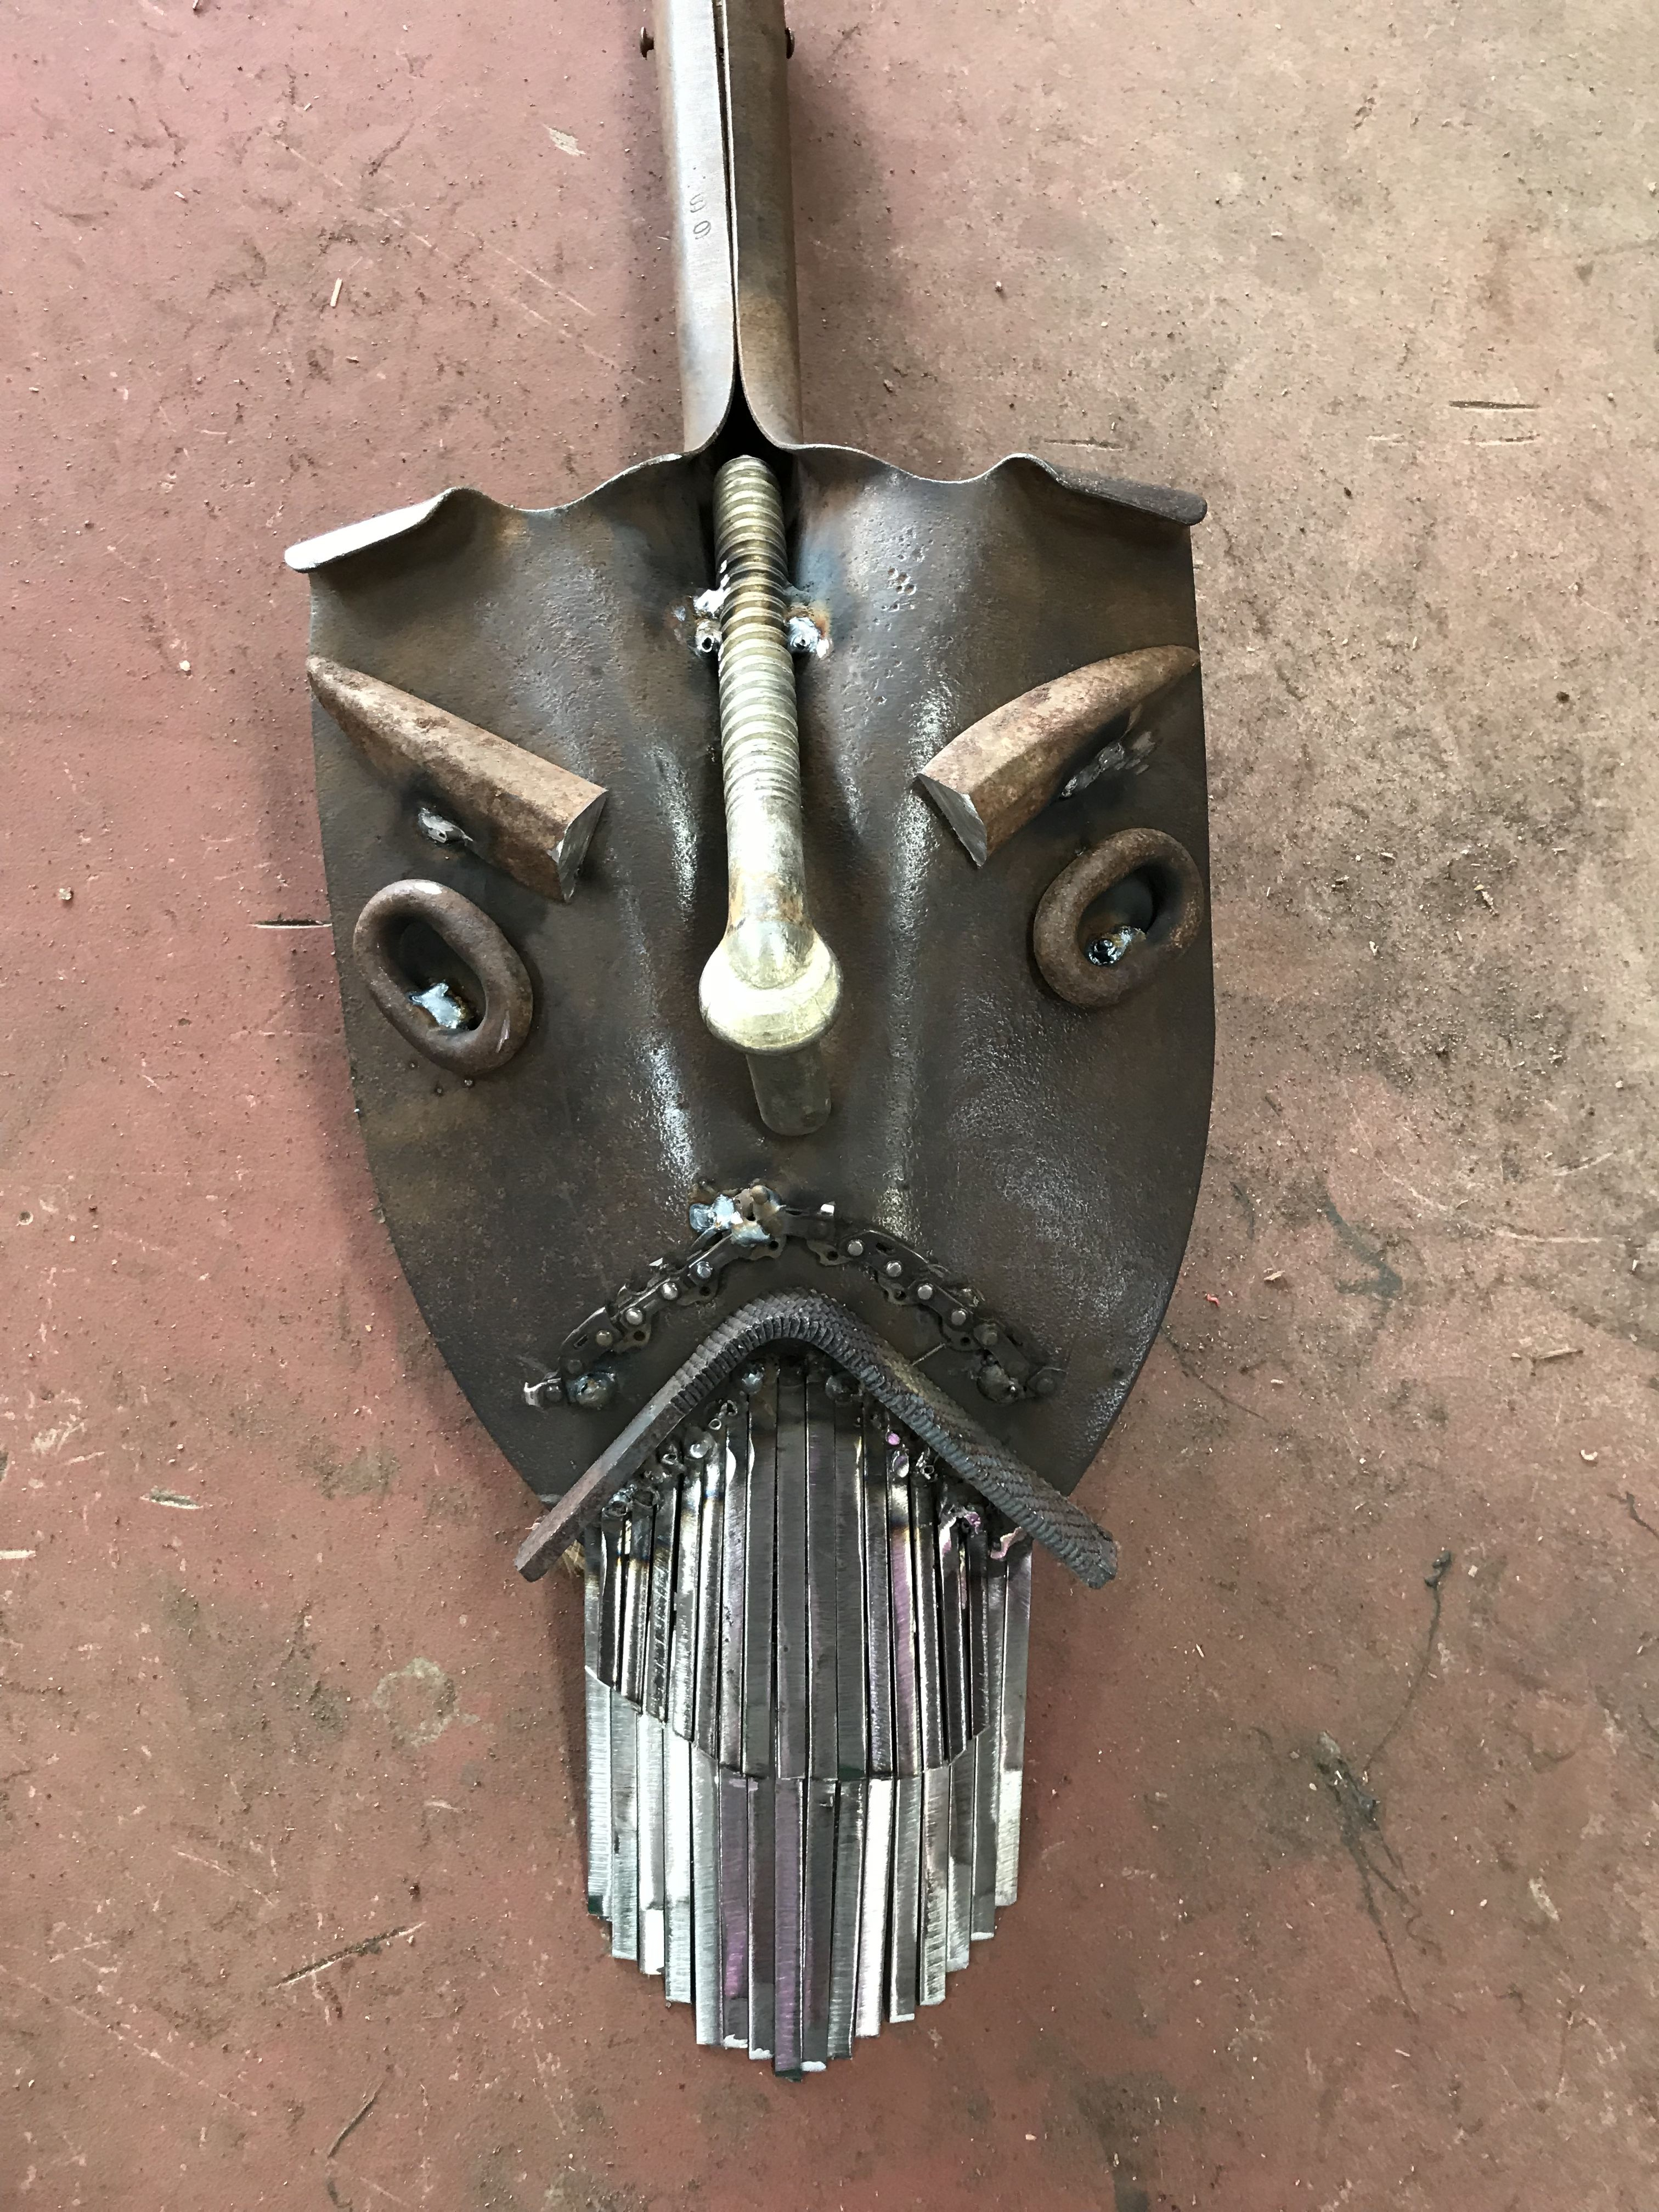 Pin by jodie ledford on eddieus junk art pinterest metal art